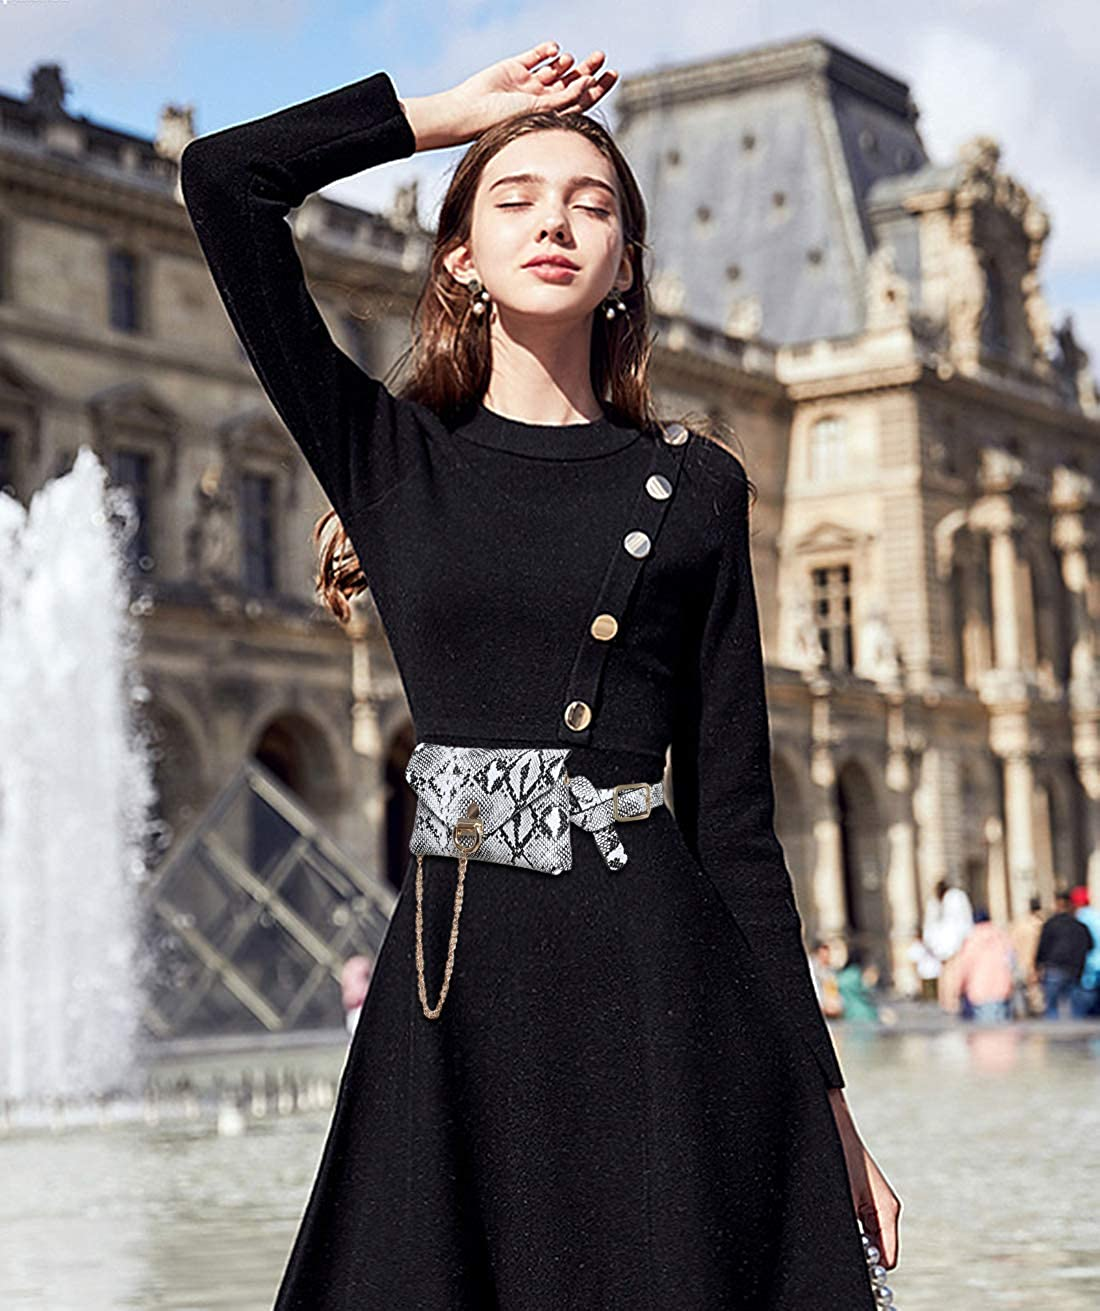 DORRISO Moda Cintura Borsa Donna Marsupio Pelle Borsa Donna Cinture Borsa per Shopping Lavoro Feste Affari